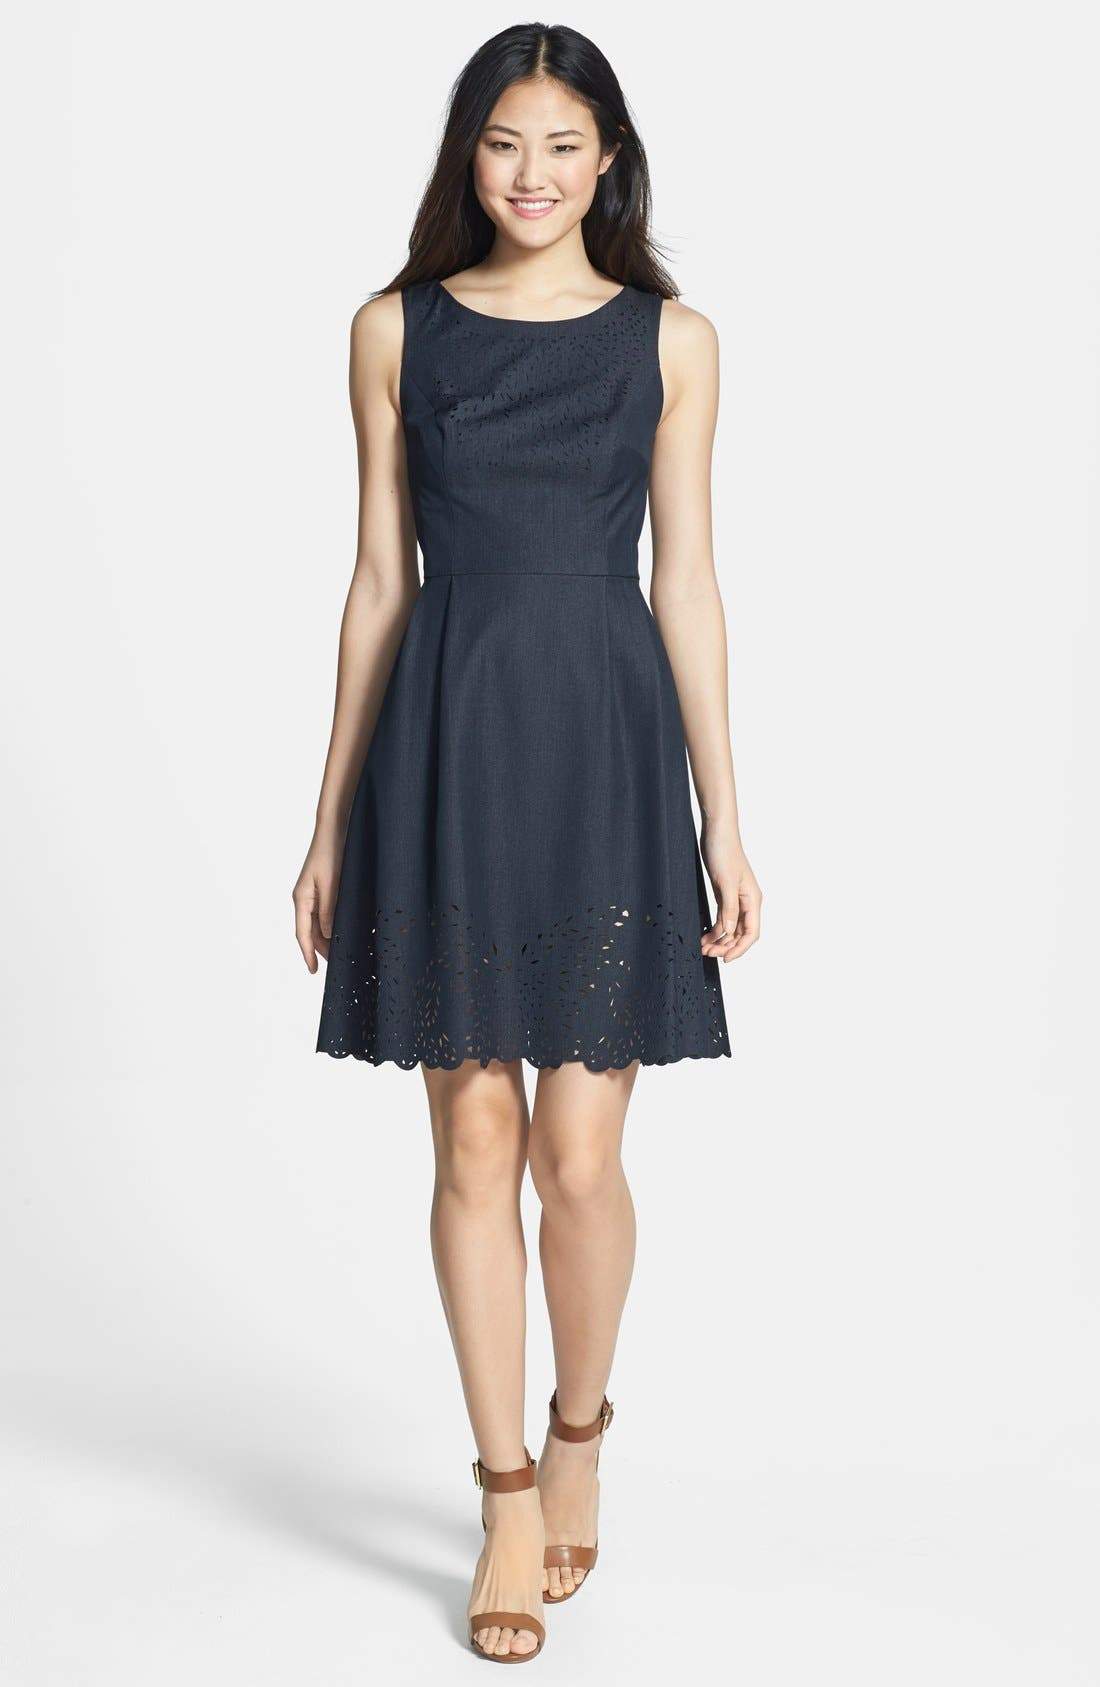 Alternate Image 1 Selected - Betsey Johnson Laser Cut Denim Fit & Flare Dress